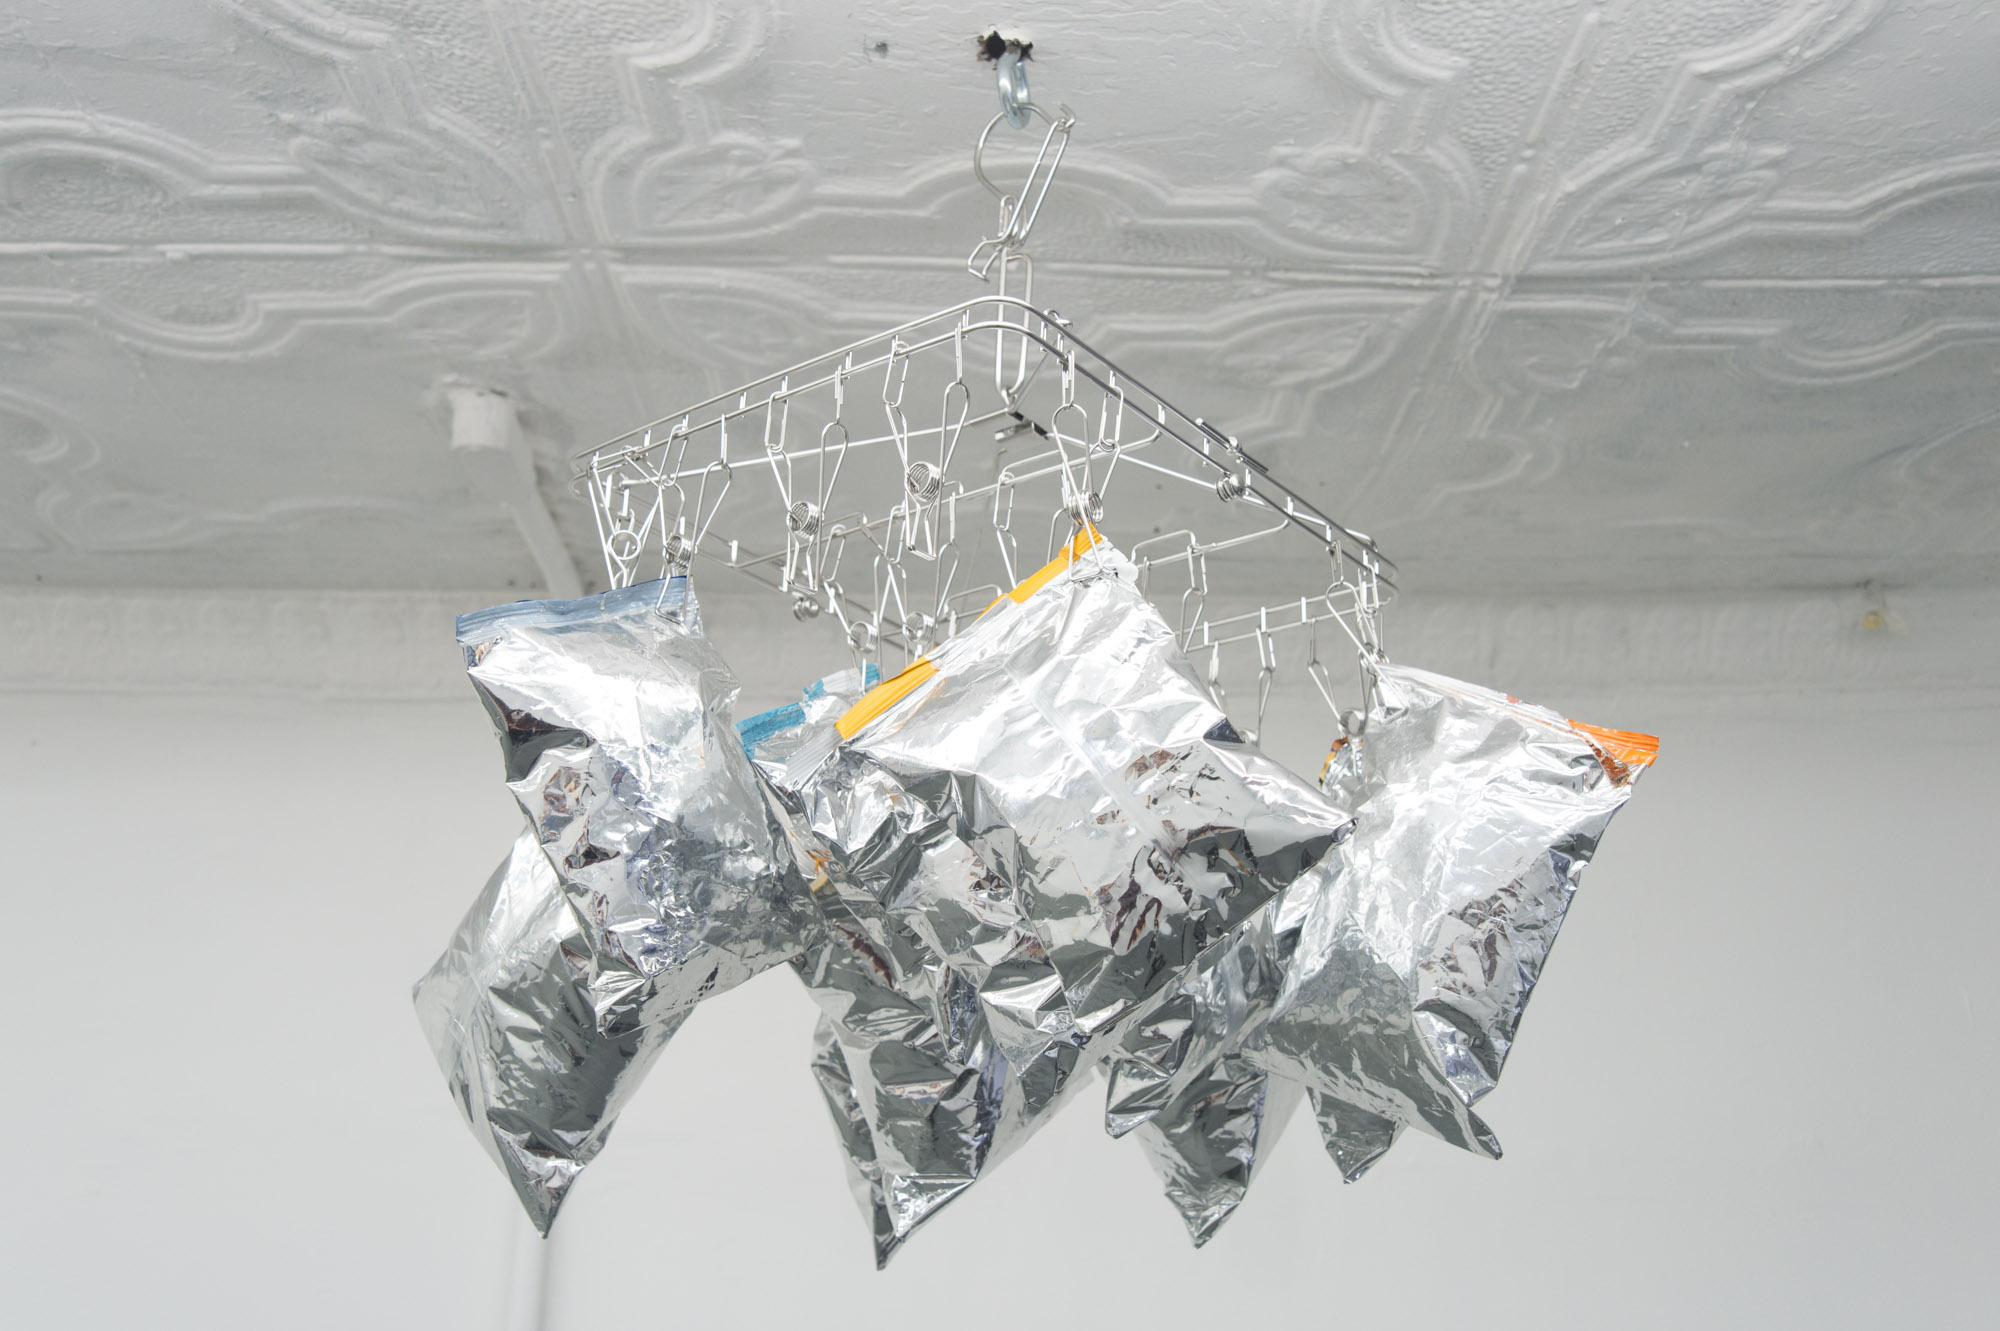 Mieko Meguro, Exhausted Helium Homage to Andy Warhol after Nobutaka Aozaki , 2016, aluminum hardware, cotton batting, potato chip bags,22 × 22 × 19 in